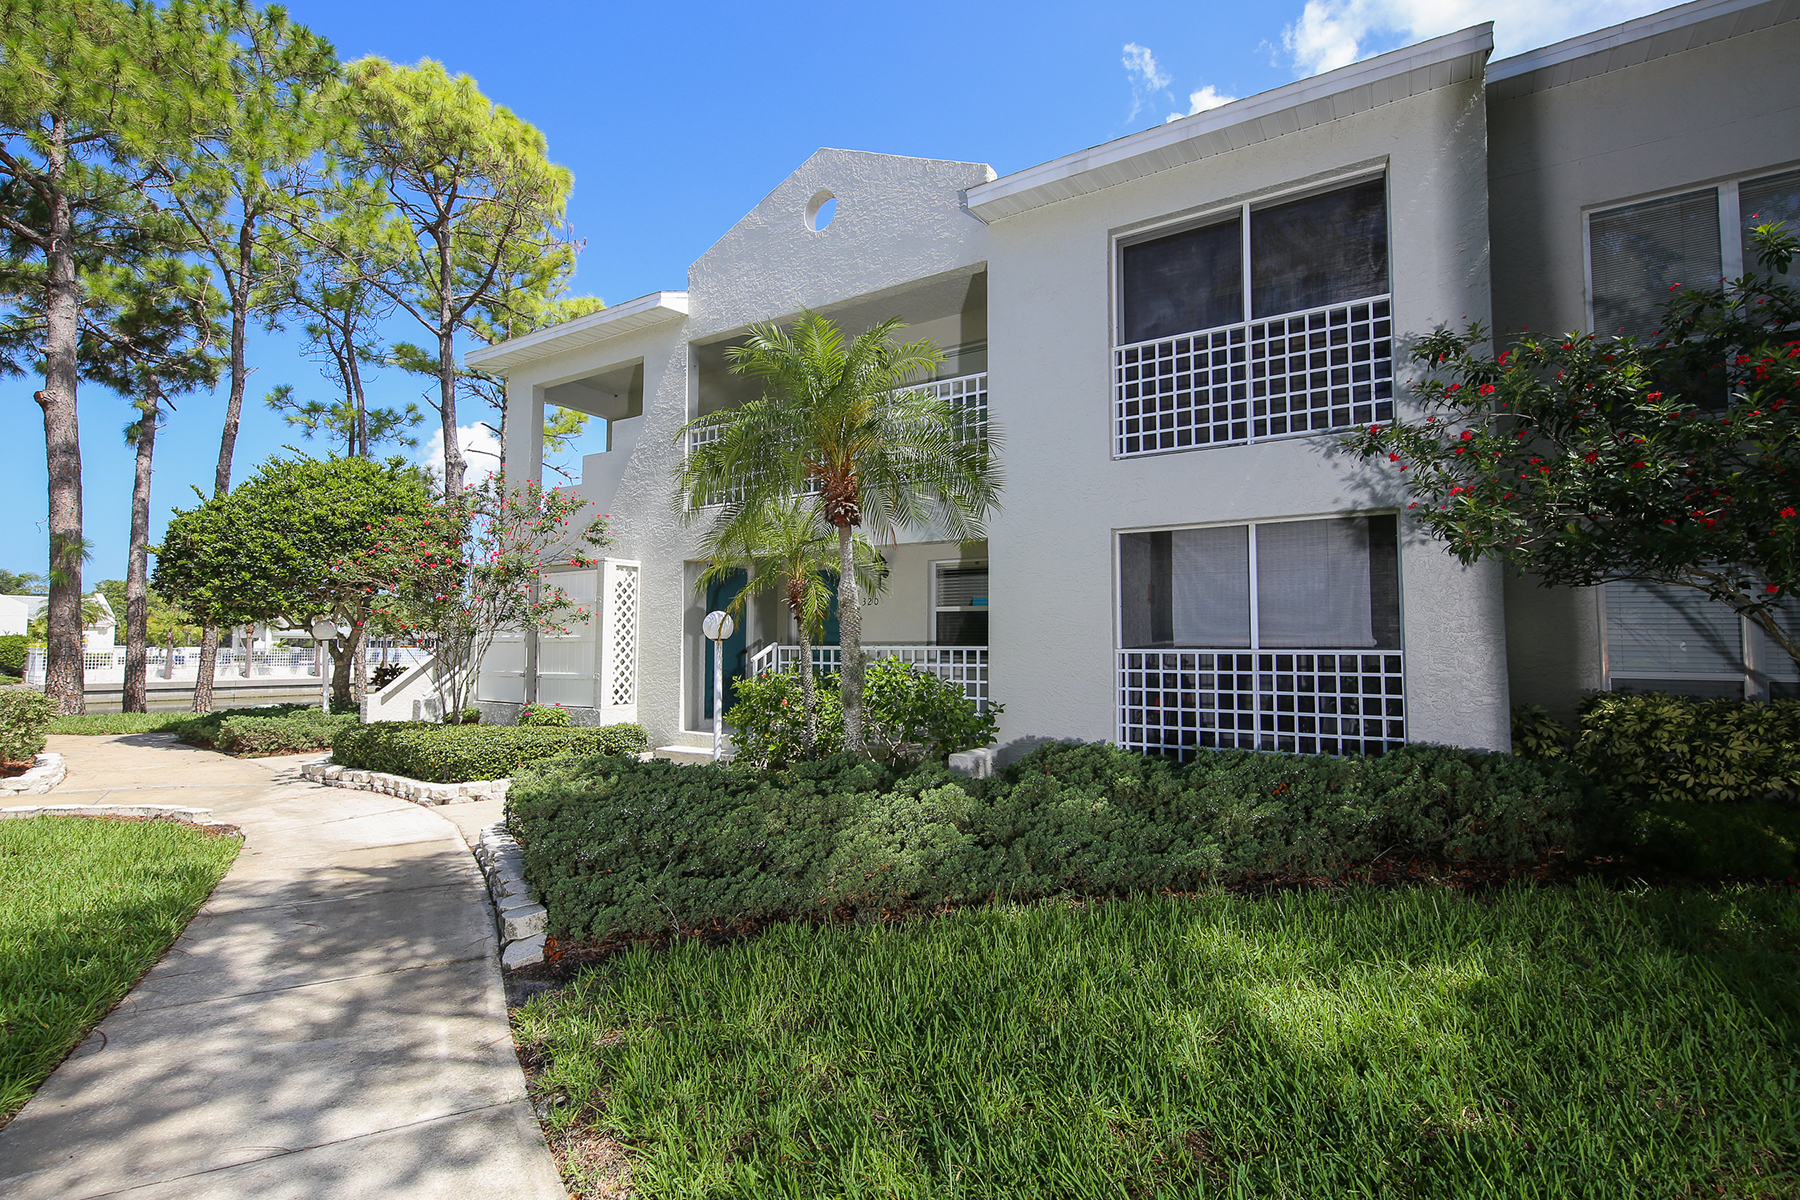 Condominio por un Venta en BRADENTON 320 108th St W 107 Bradenton, Florida, 34209 Estados Unidos